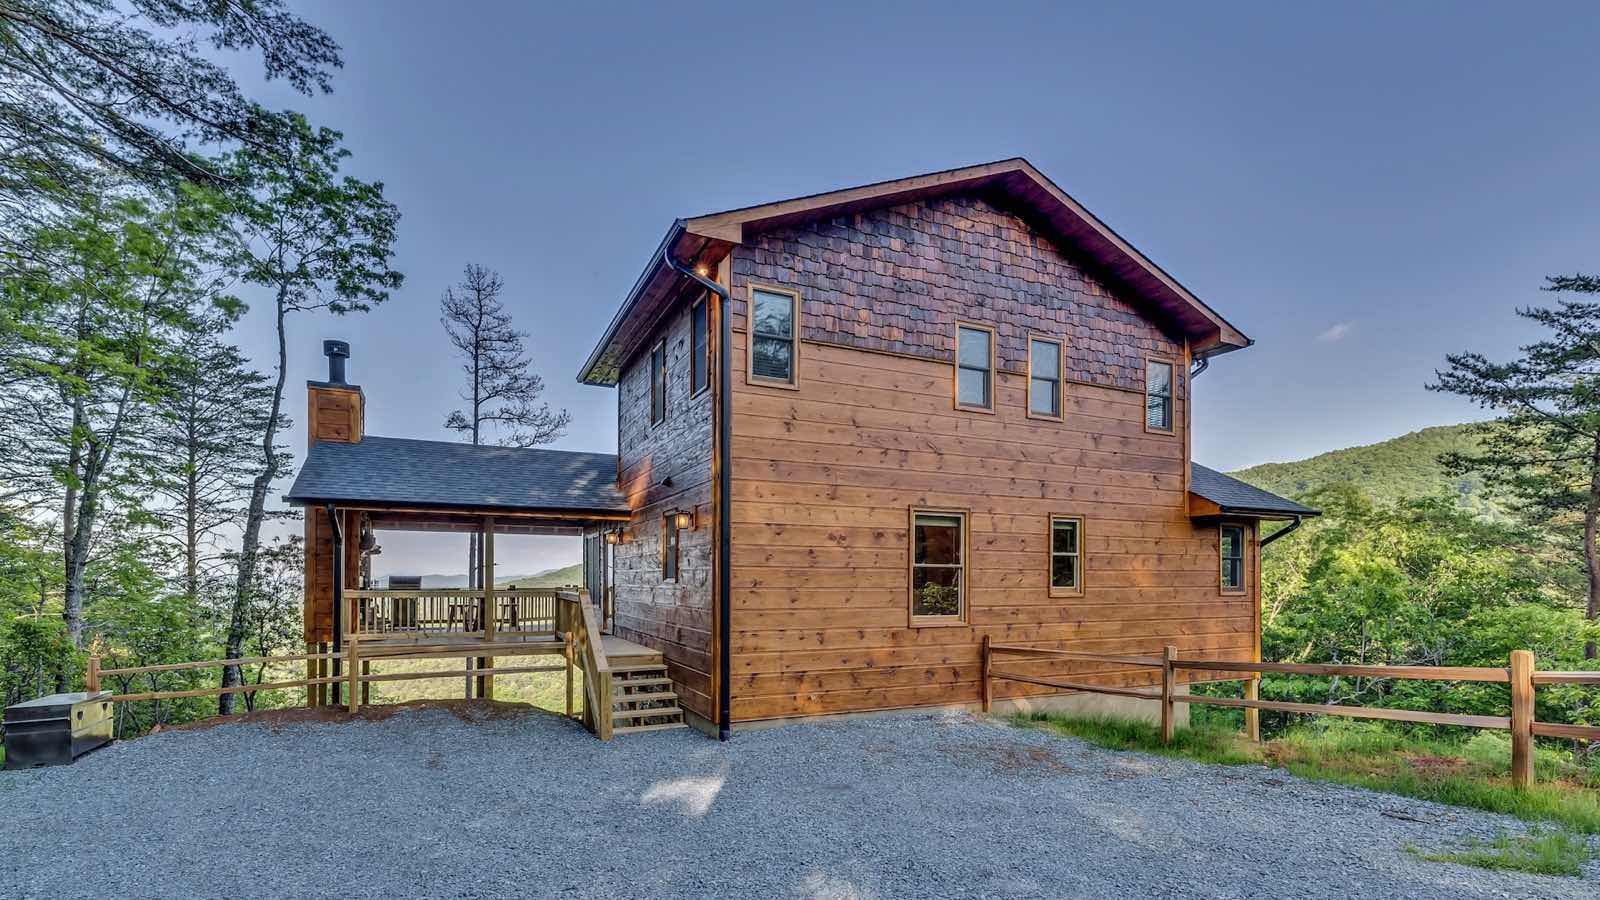 Endless view lodge rental cabin blue ridge ga for Blue ridge ga cabins for rent